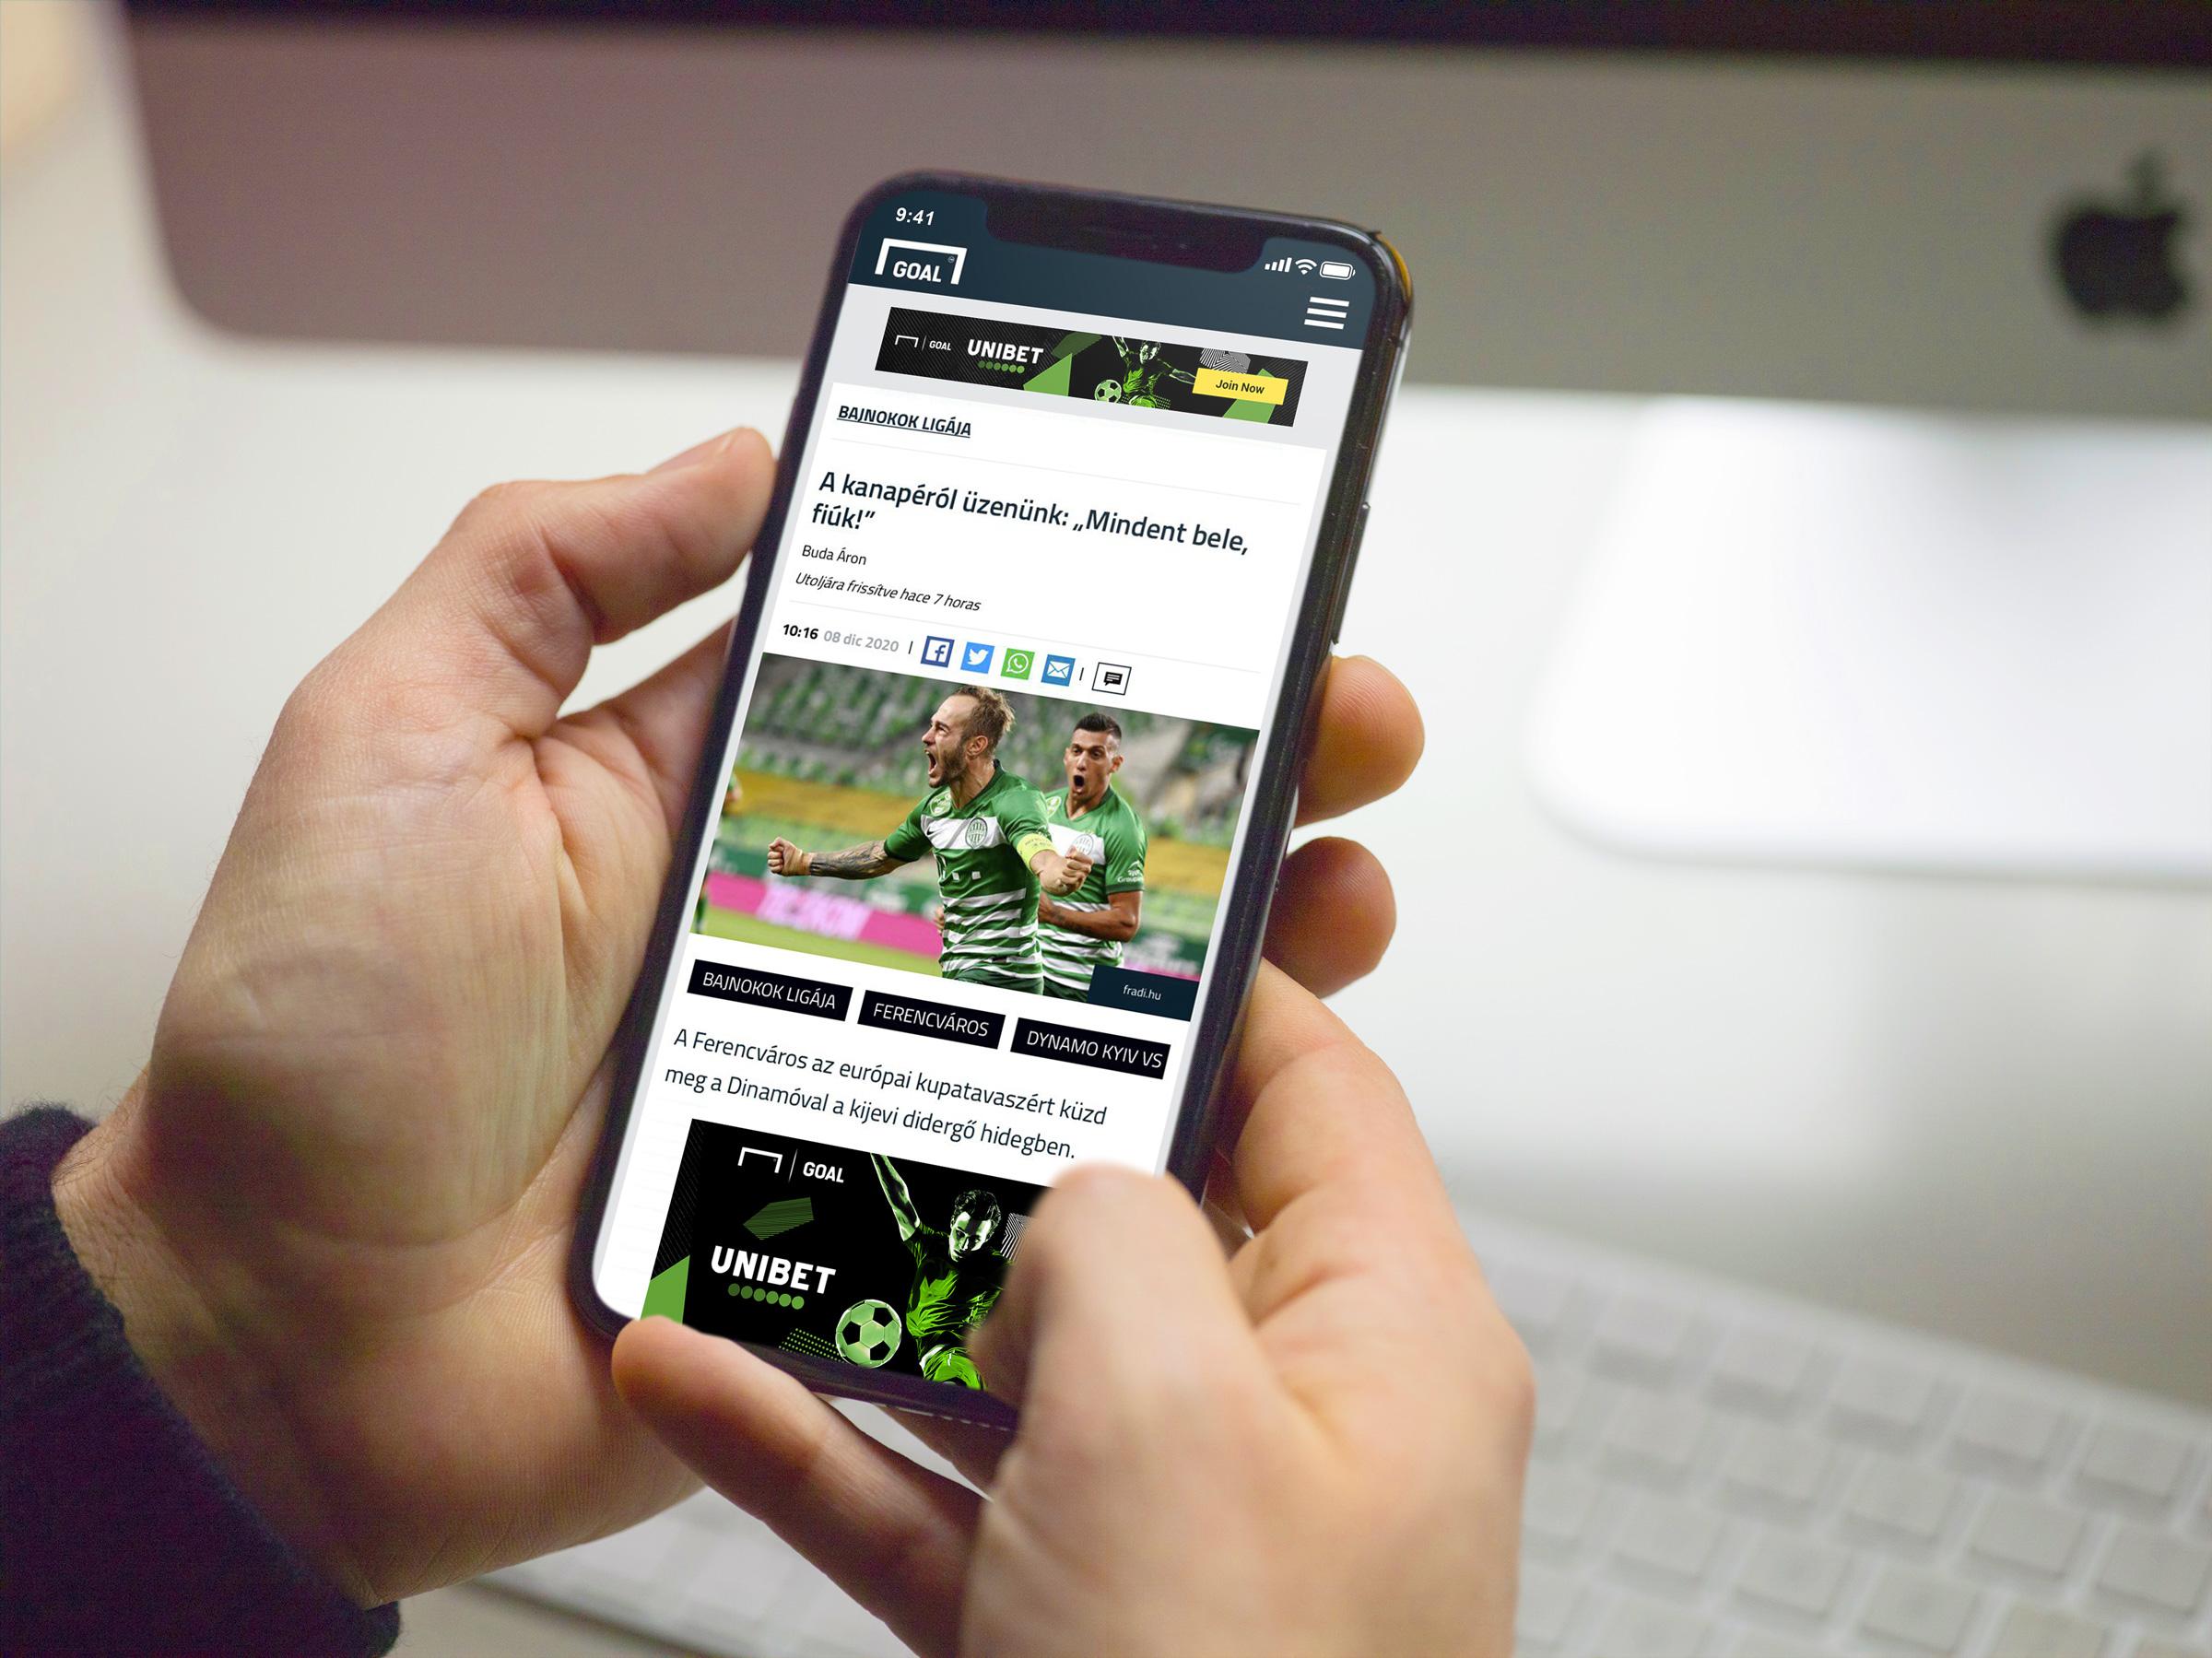 Sponsored Football Articles